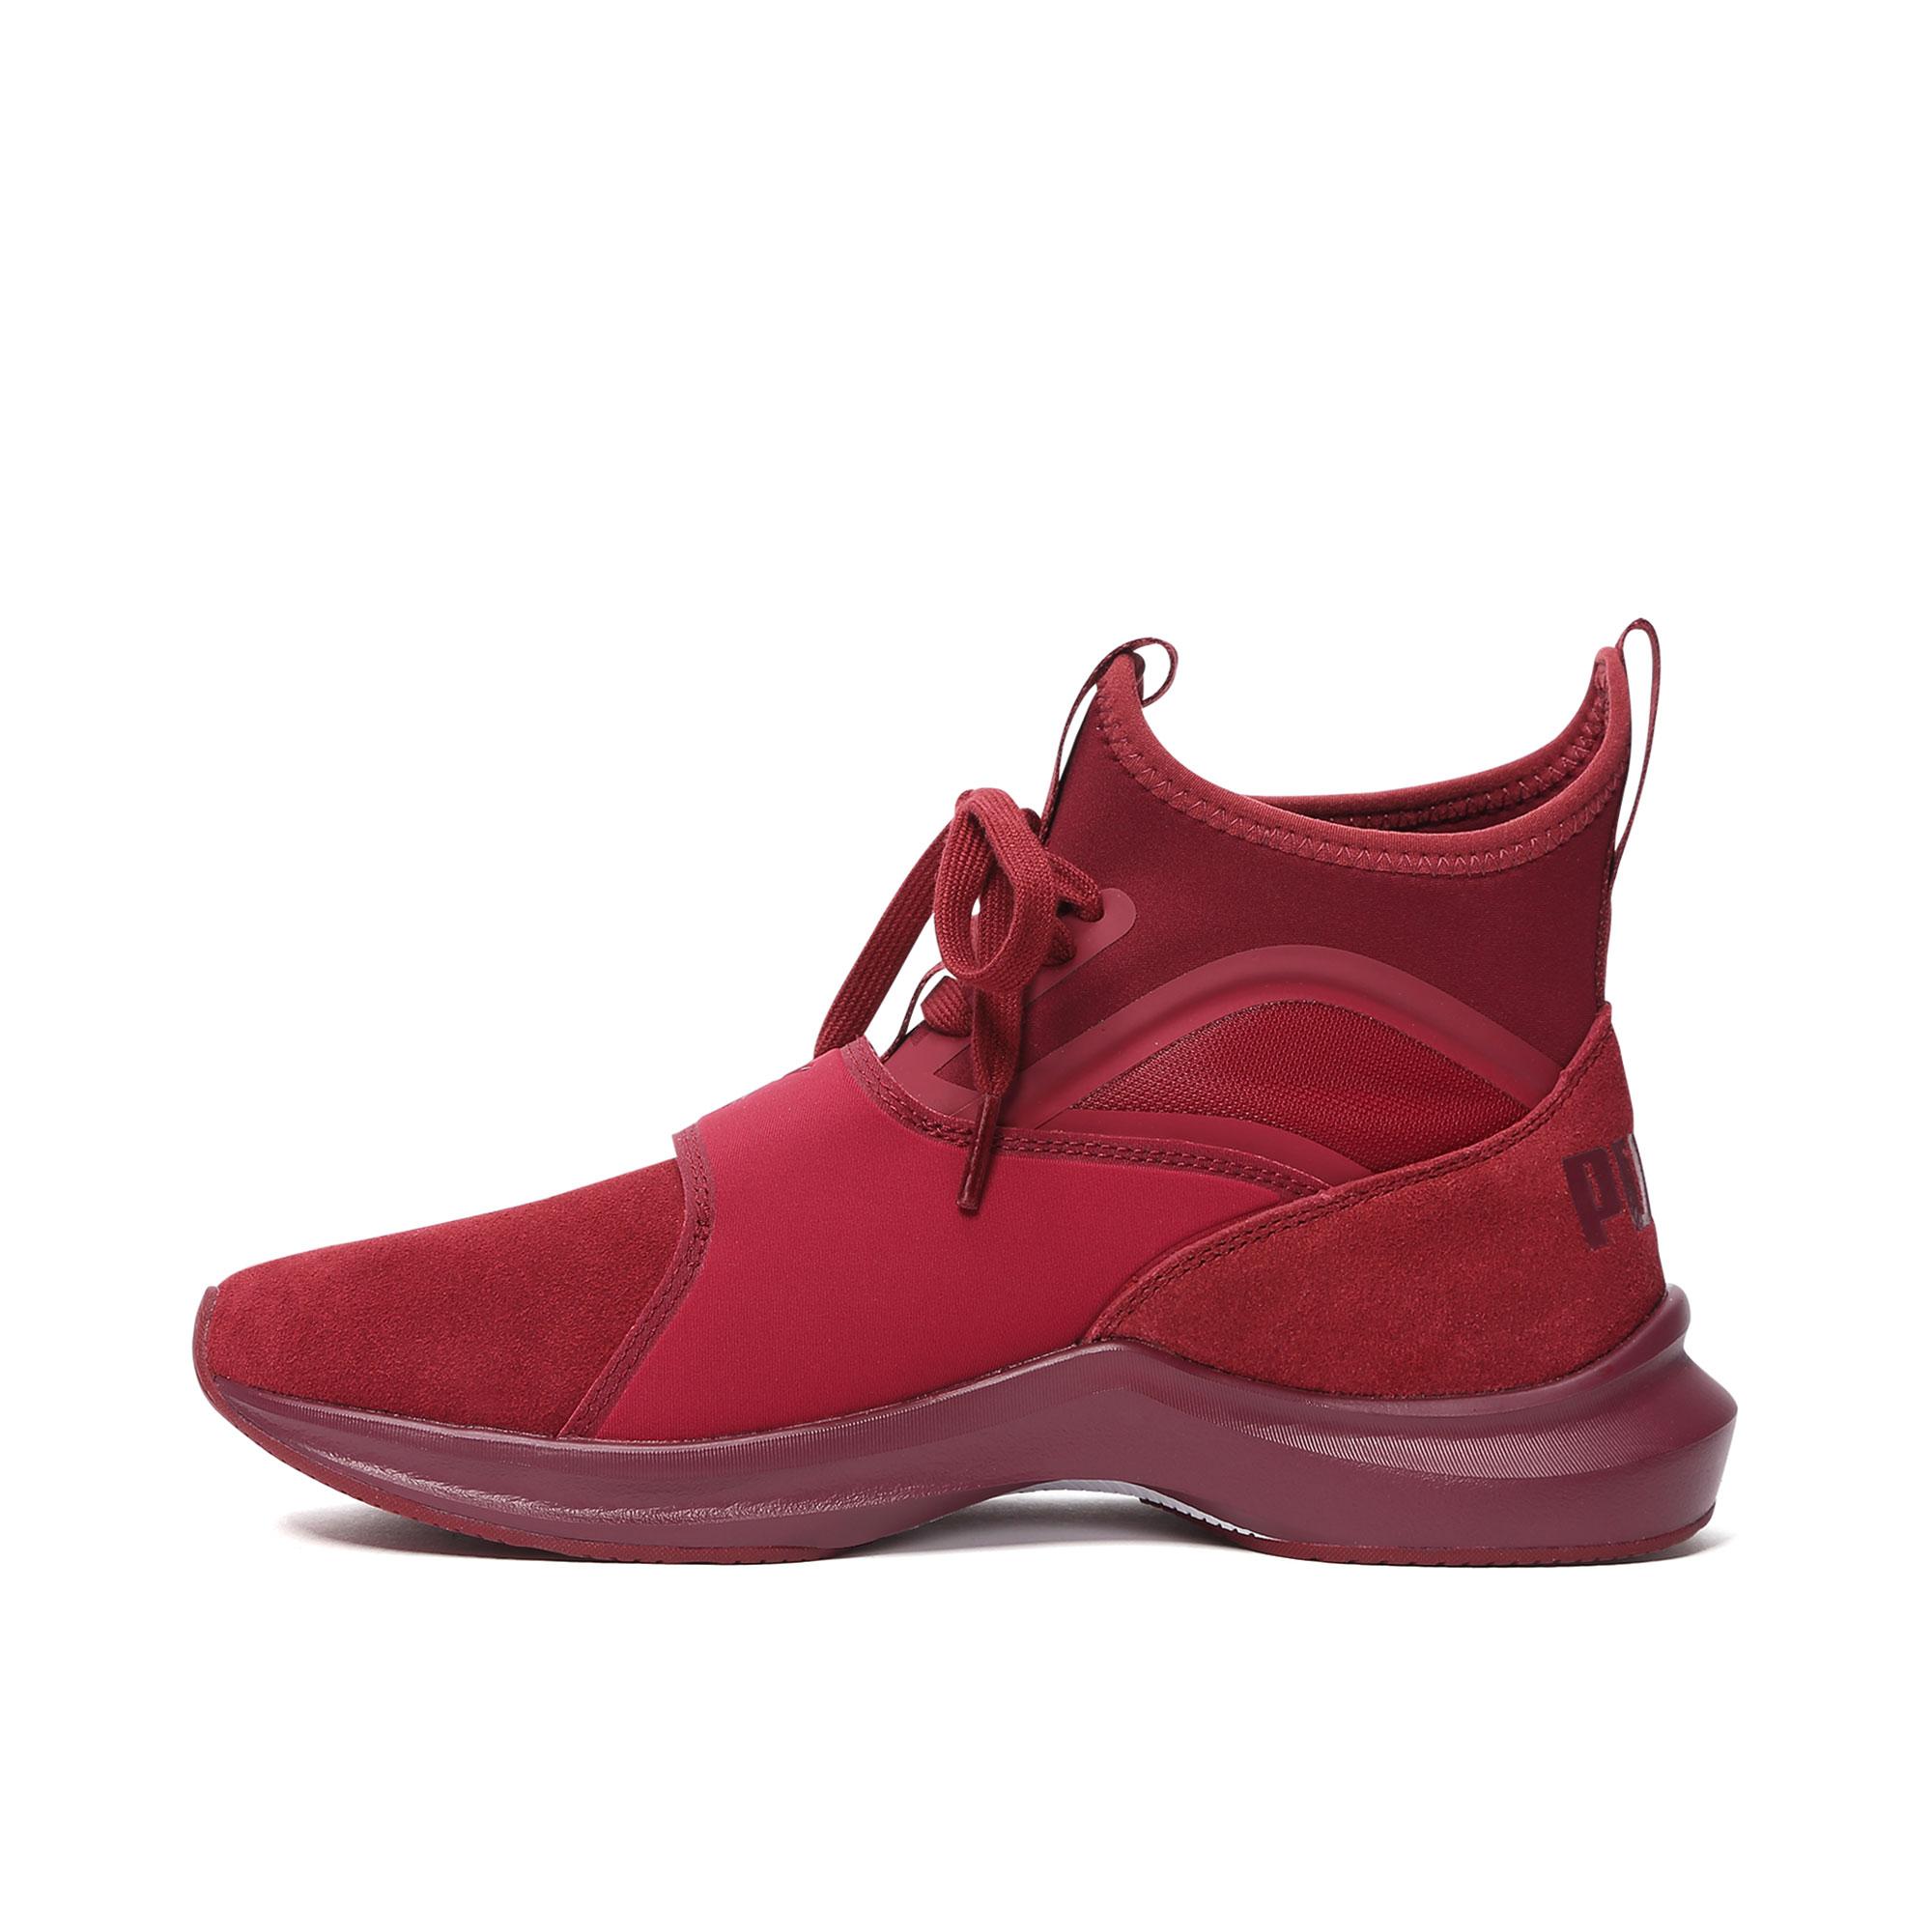 5a415c7b3c3 PUMA Hummer Official Women s Training Shoes Phenom SUEDE ...